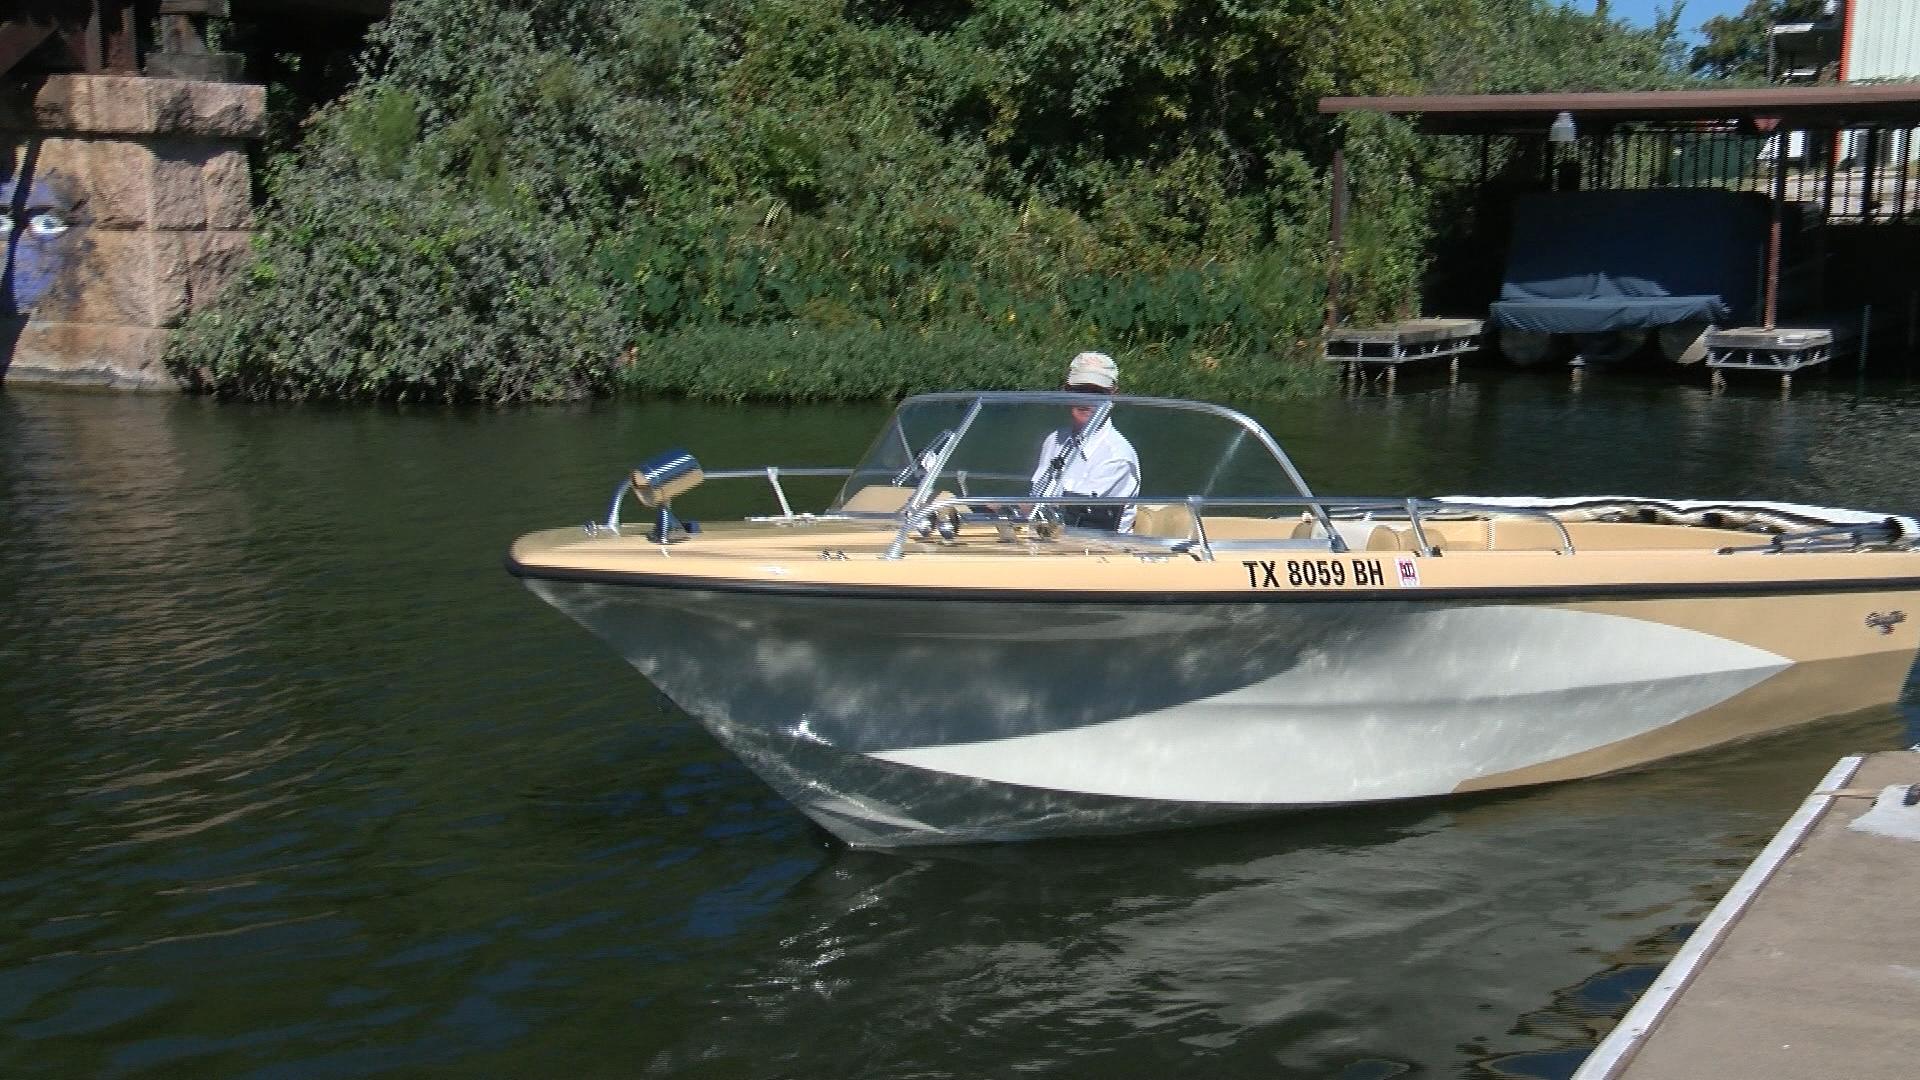 lee gadiss lbj boat_1535767969956.jpg.jpg